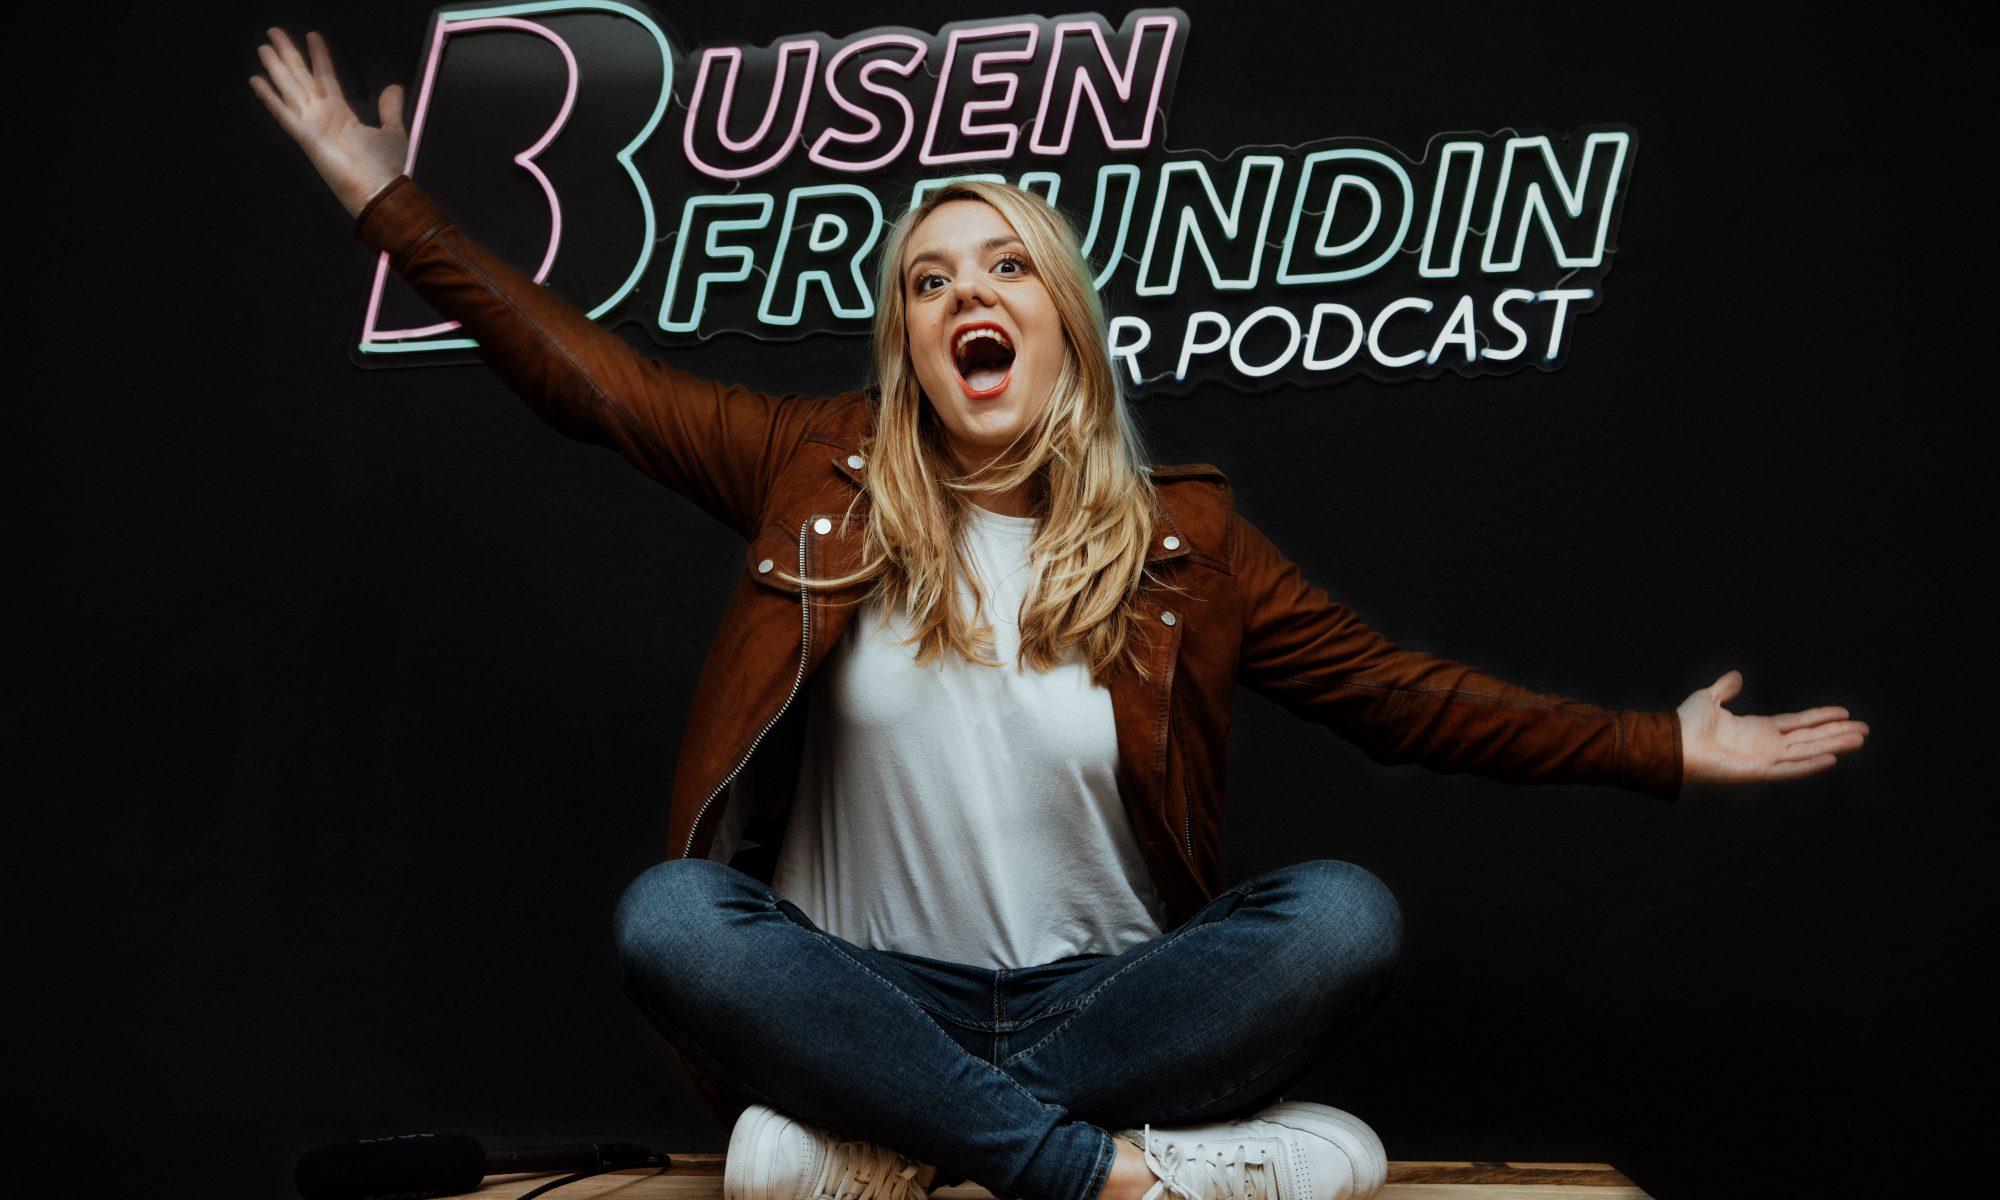 Eure top 5 podcastfolgen 2020